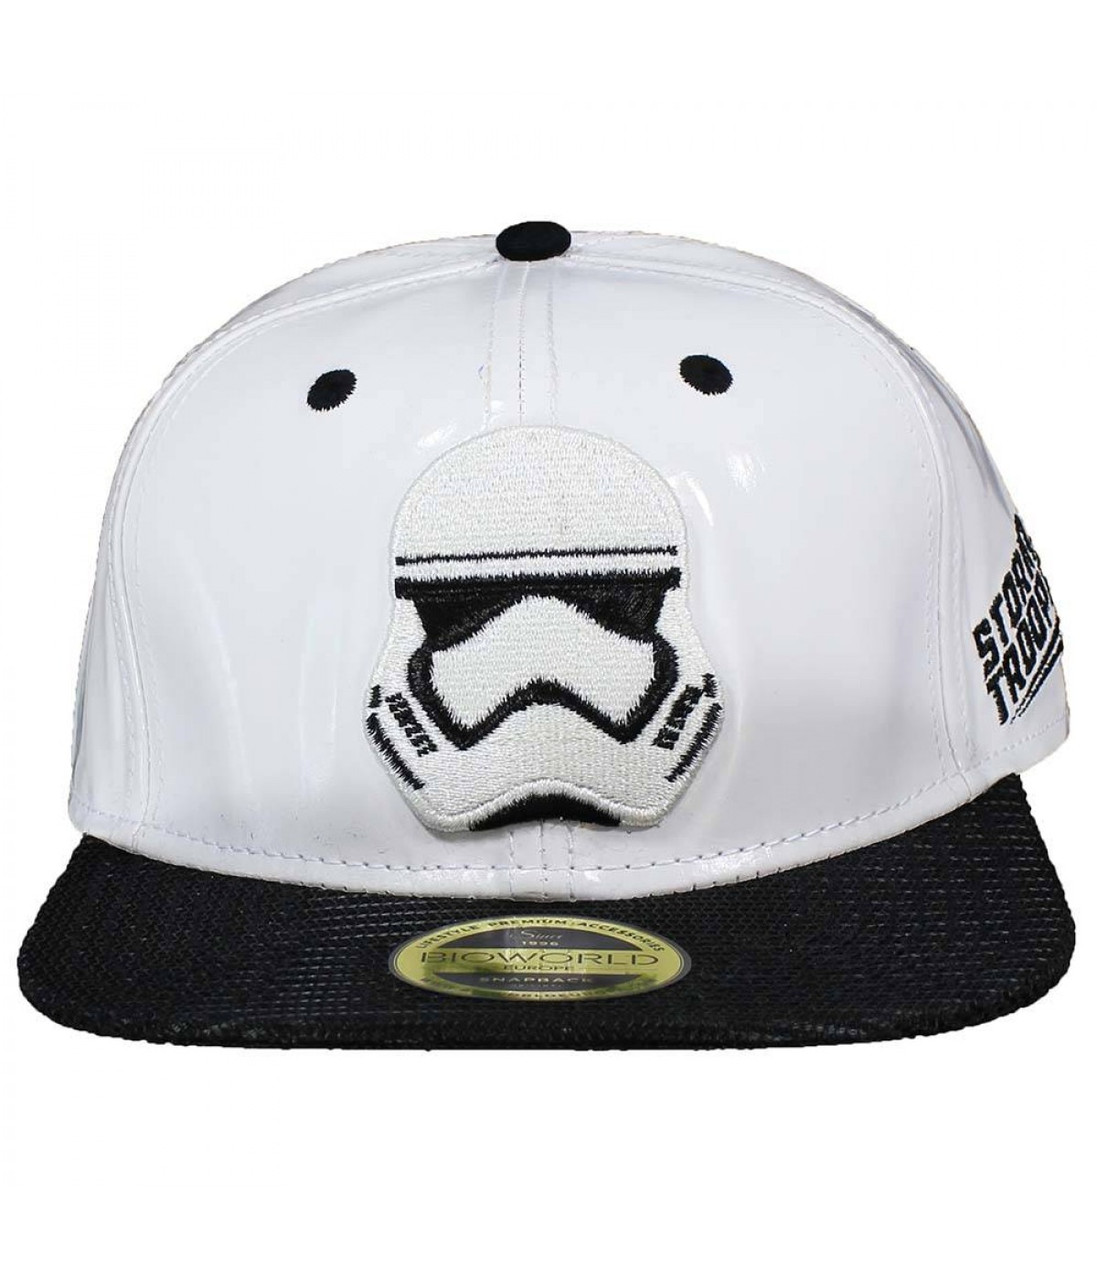 Офіційний снепбек Star Wars - White Snap back With Storm Trooper Embroidery And Black Bill